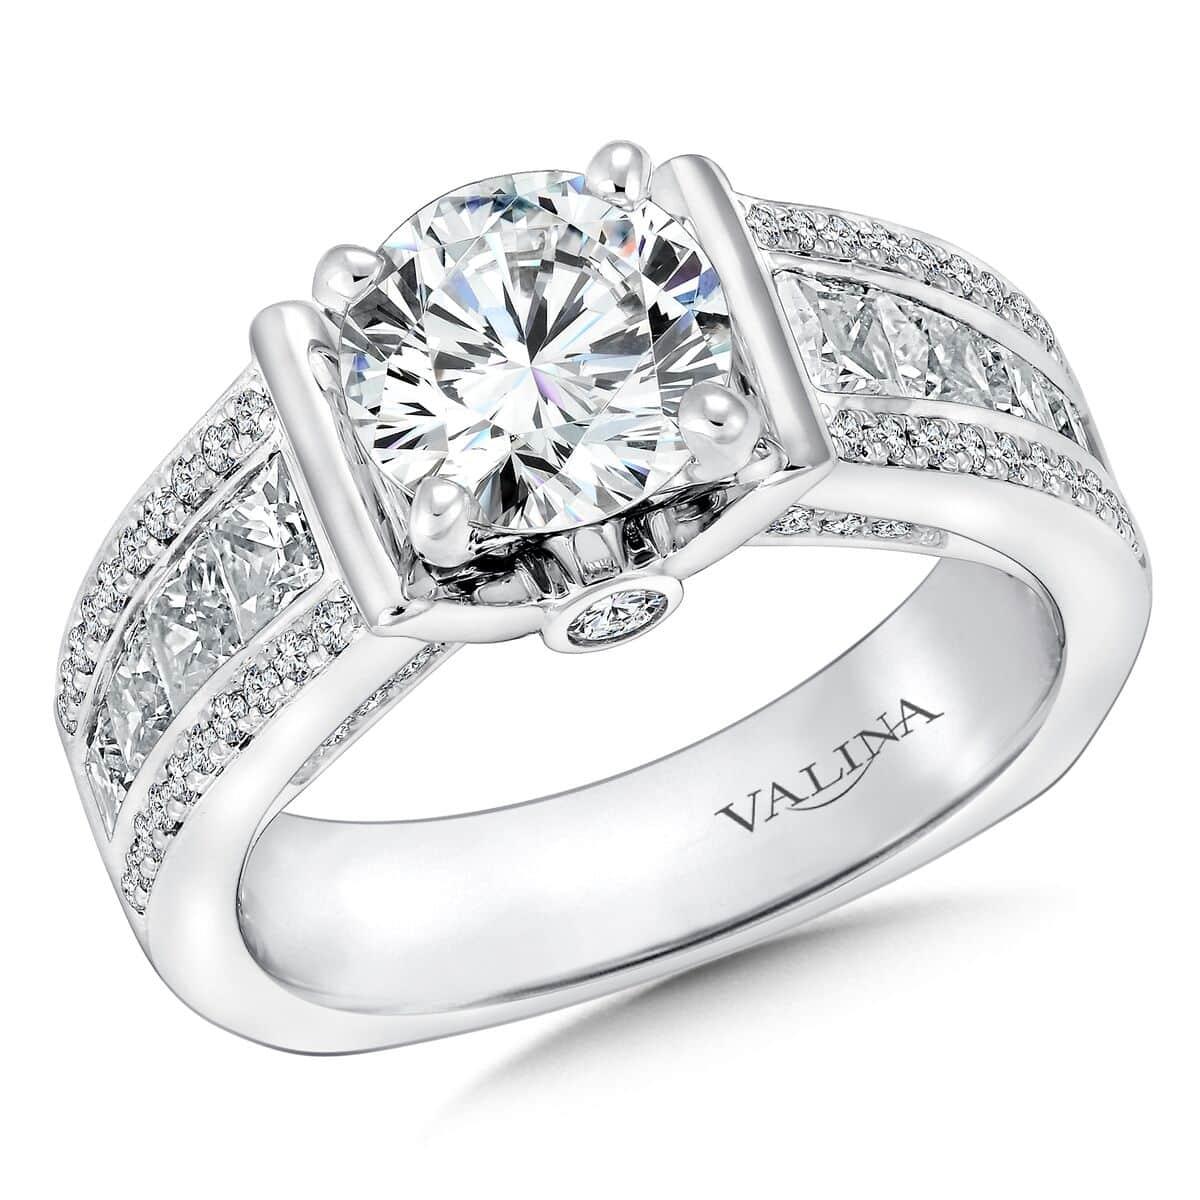 Custom_Round_Diamond_Engagement_rings_in_Dallas_texas_-_Wholesale_diamonds_and_Custom_diamond_Rigns_in_Dallas_texas